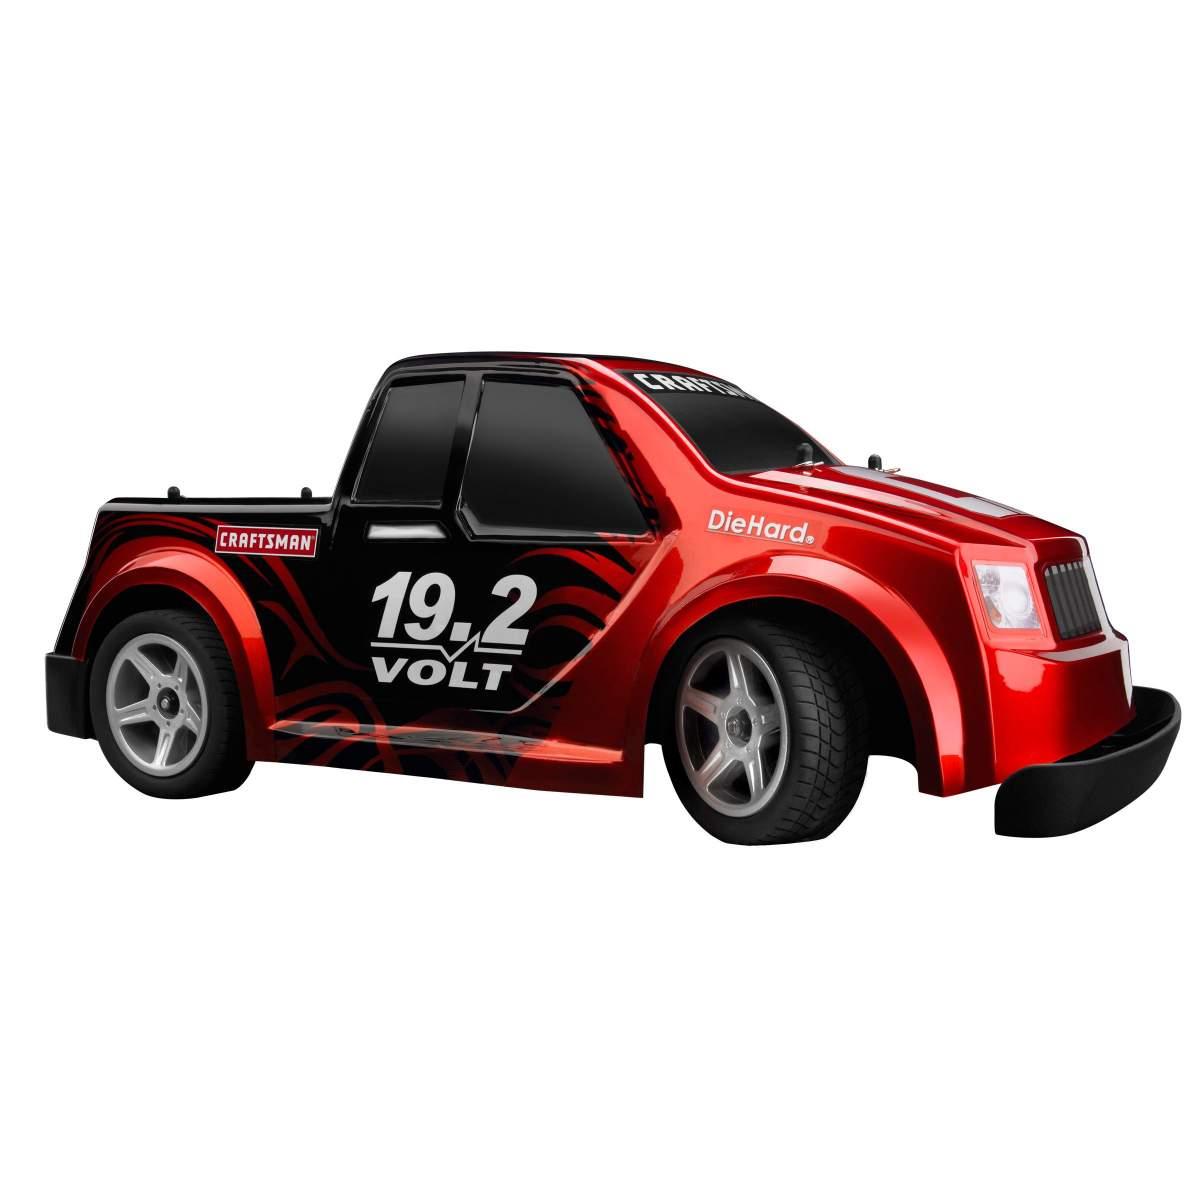 Craftsman RC Race Truck Design & Build-img_1446-jpg